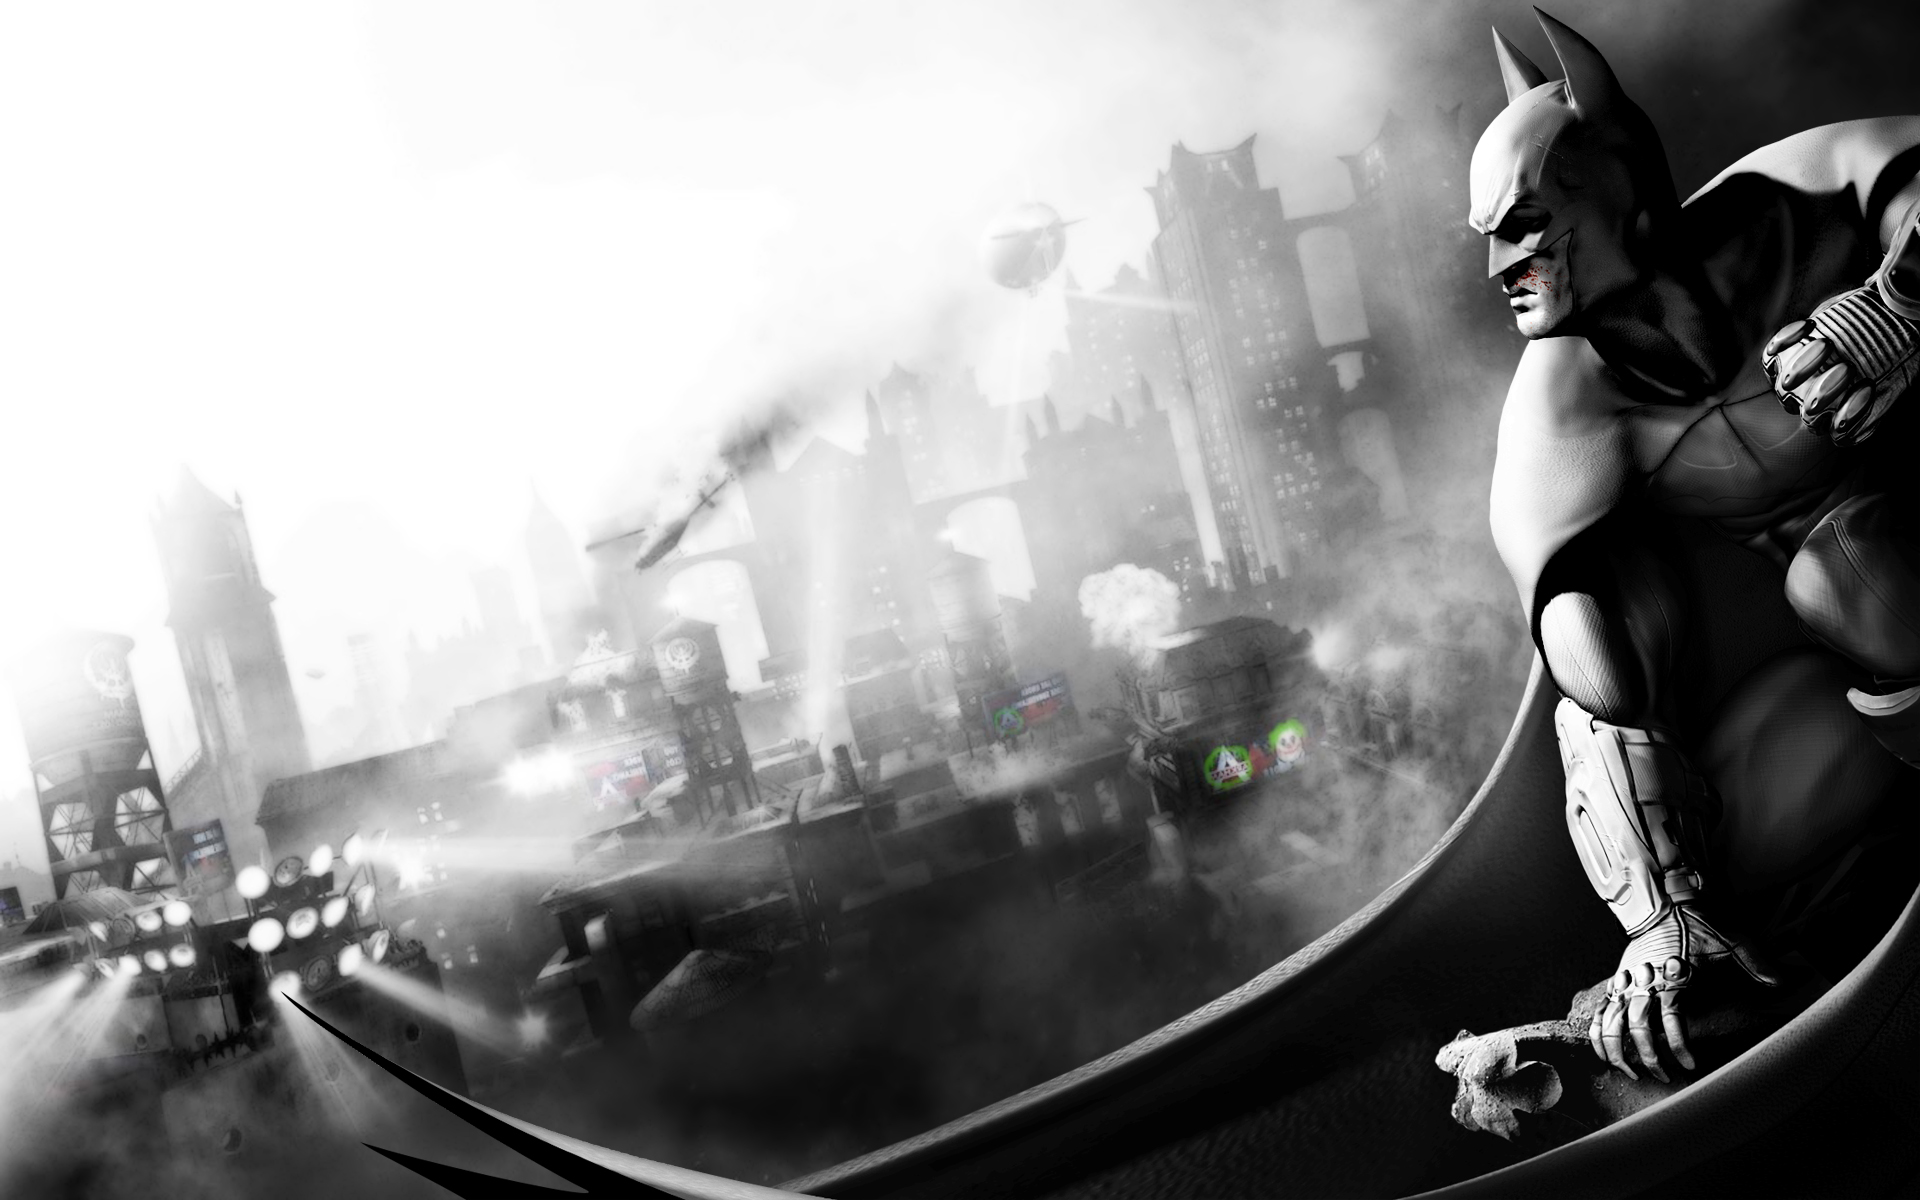 Batman Arkham City Harley Quinn Xbox 360 Wiring Diagrams Circuit Board Kit 325878 751 237 00 Carrier Hd Wallpaper Wallpapersafari Asylum Nightwing